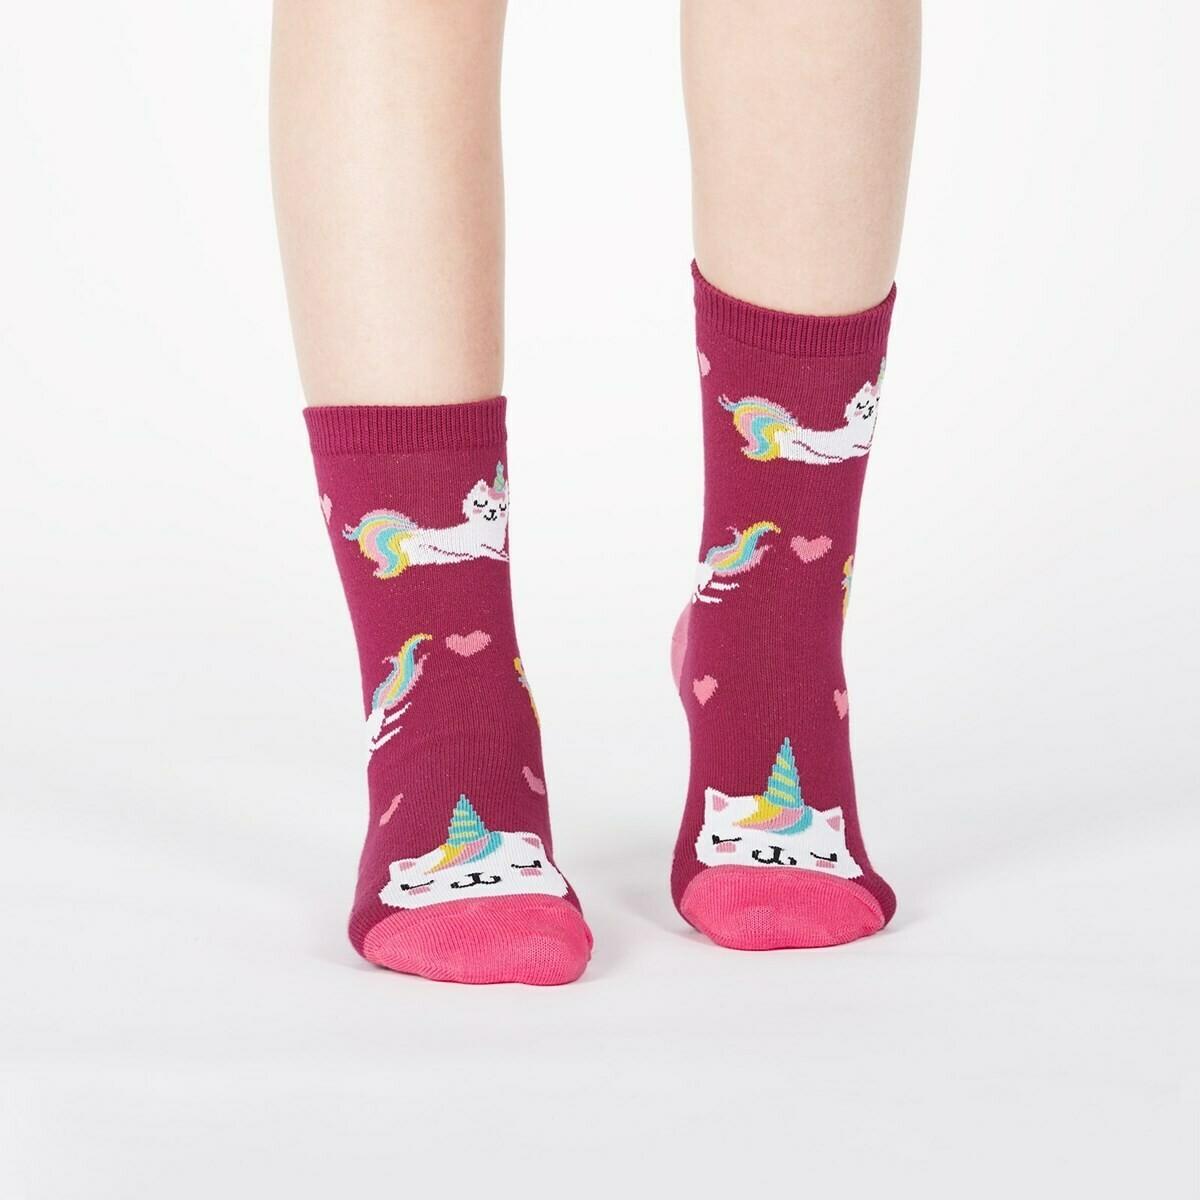 Sock it to Me - Junior Socks